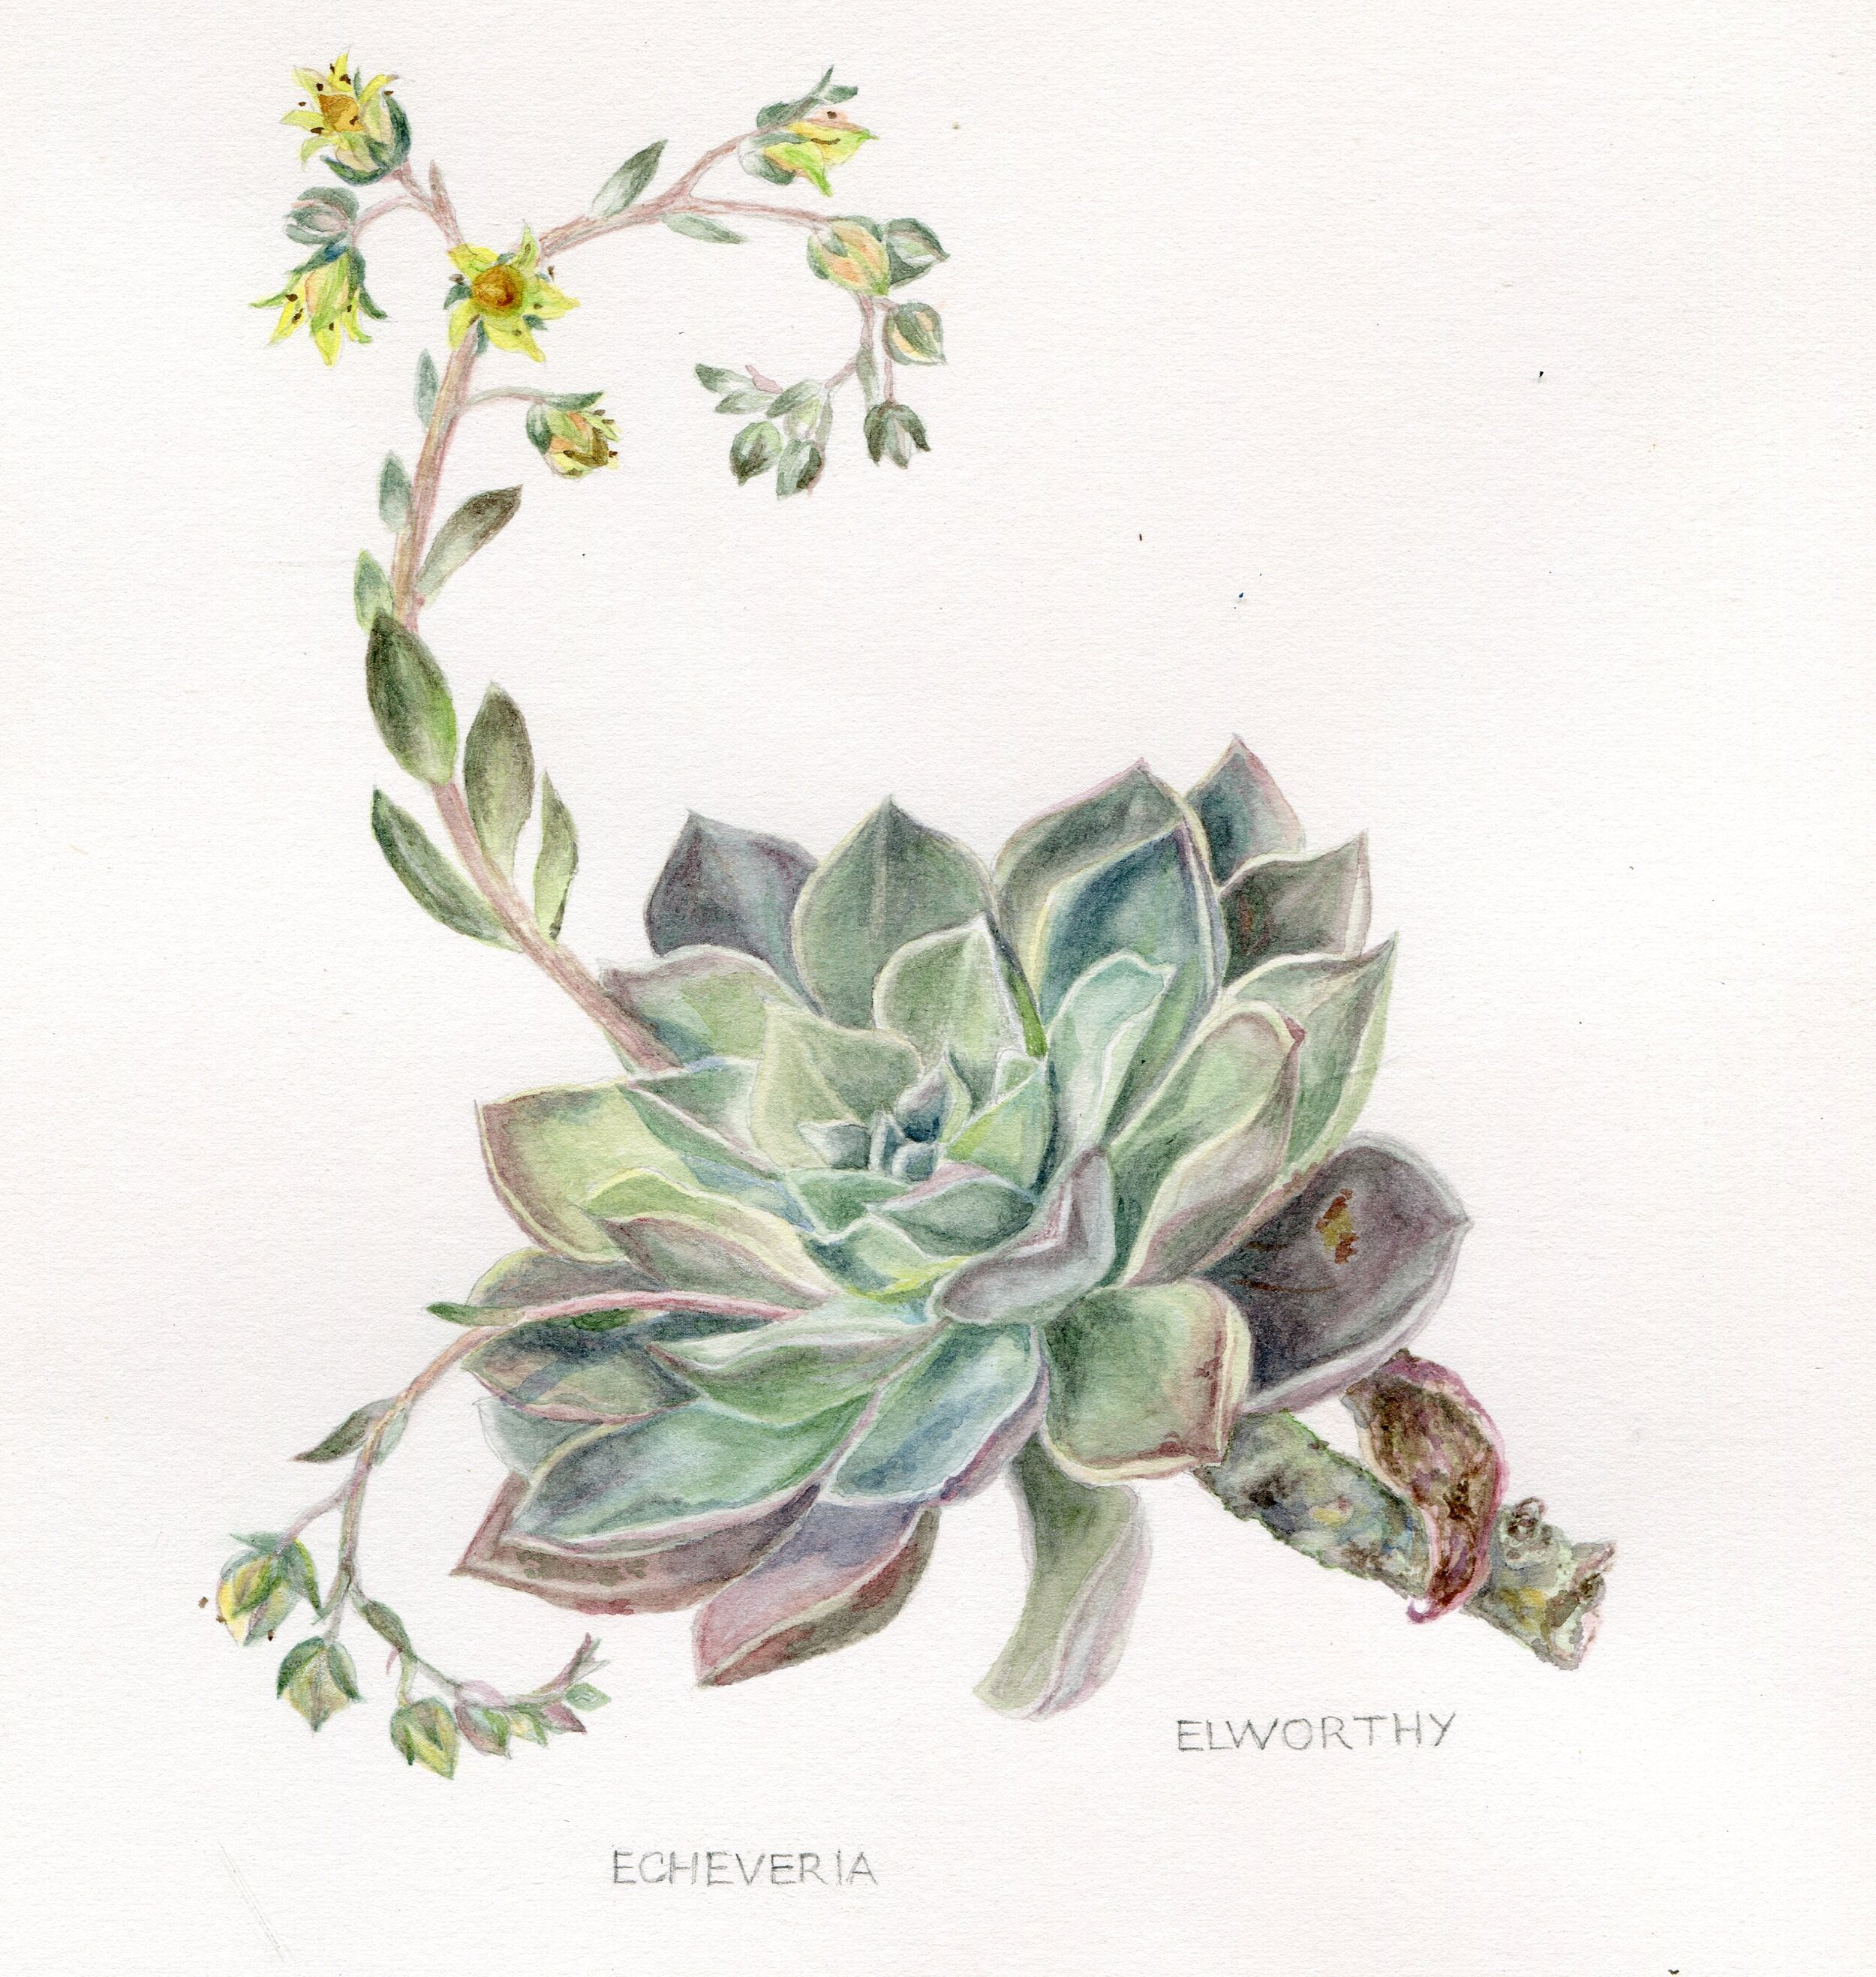 60a  Jean Elworthy  Echeveria  watercolour on paper